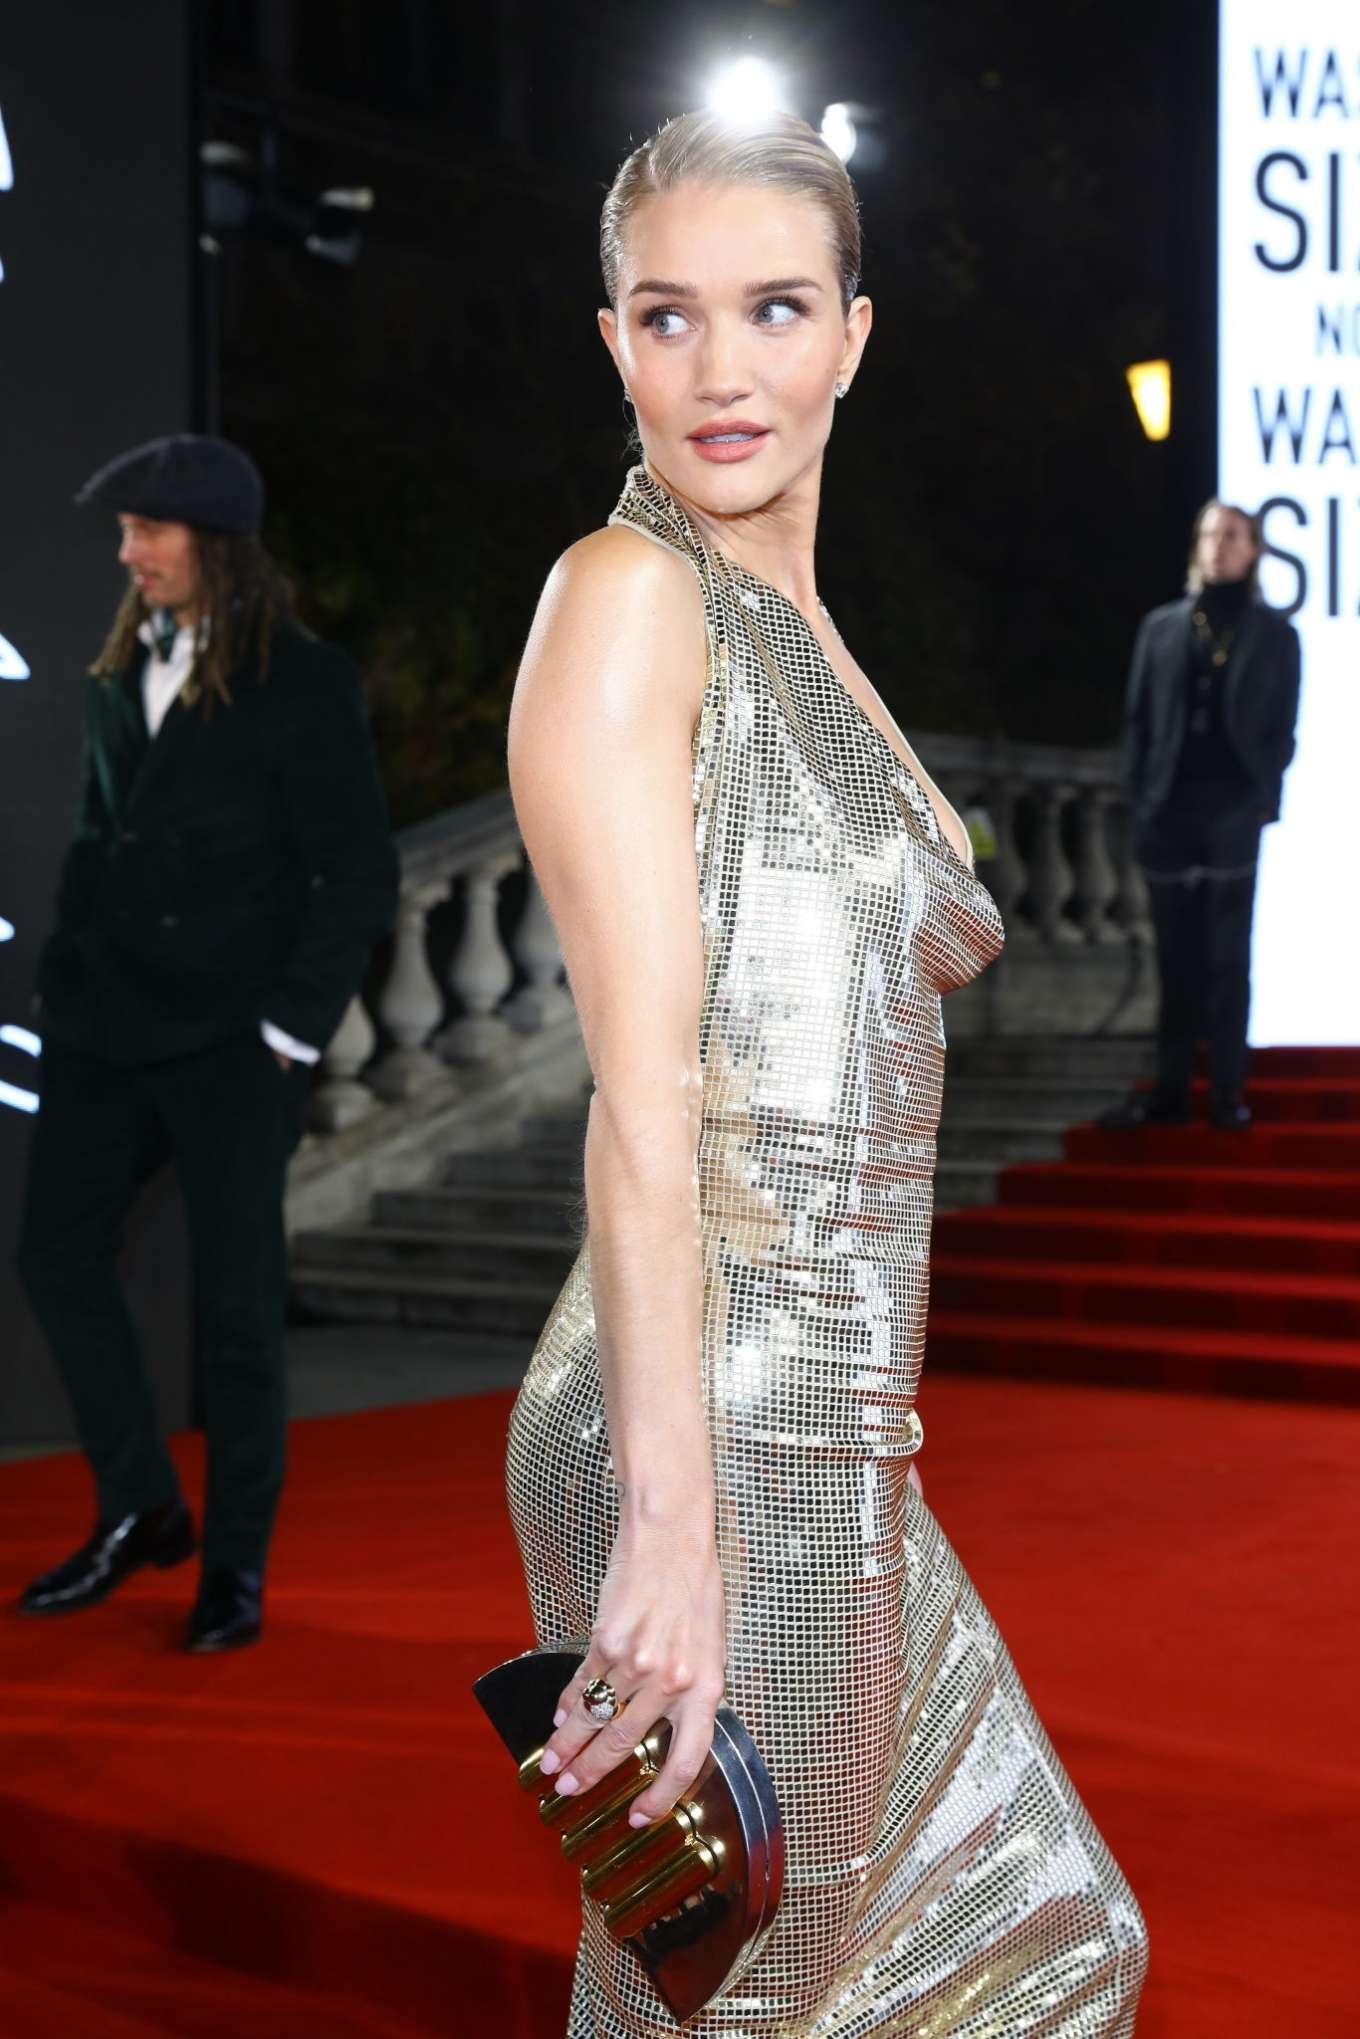 Rosie Hungtington Whiteley 2019 : Rosie Hungtington Whiteley – Fashion Awards 2019 in London-16